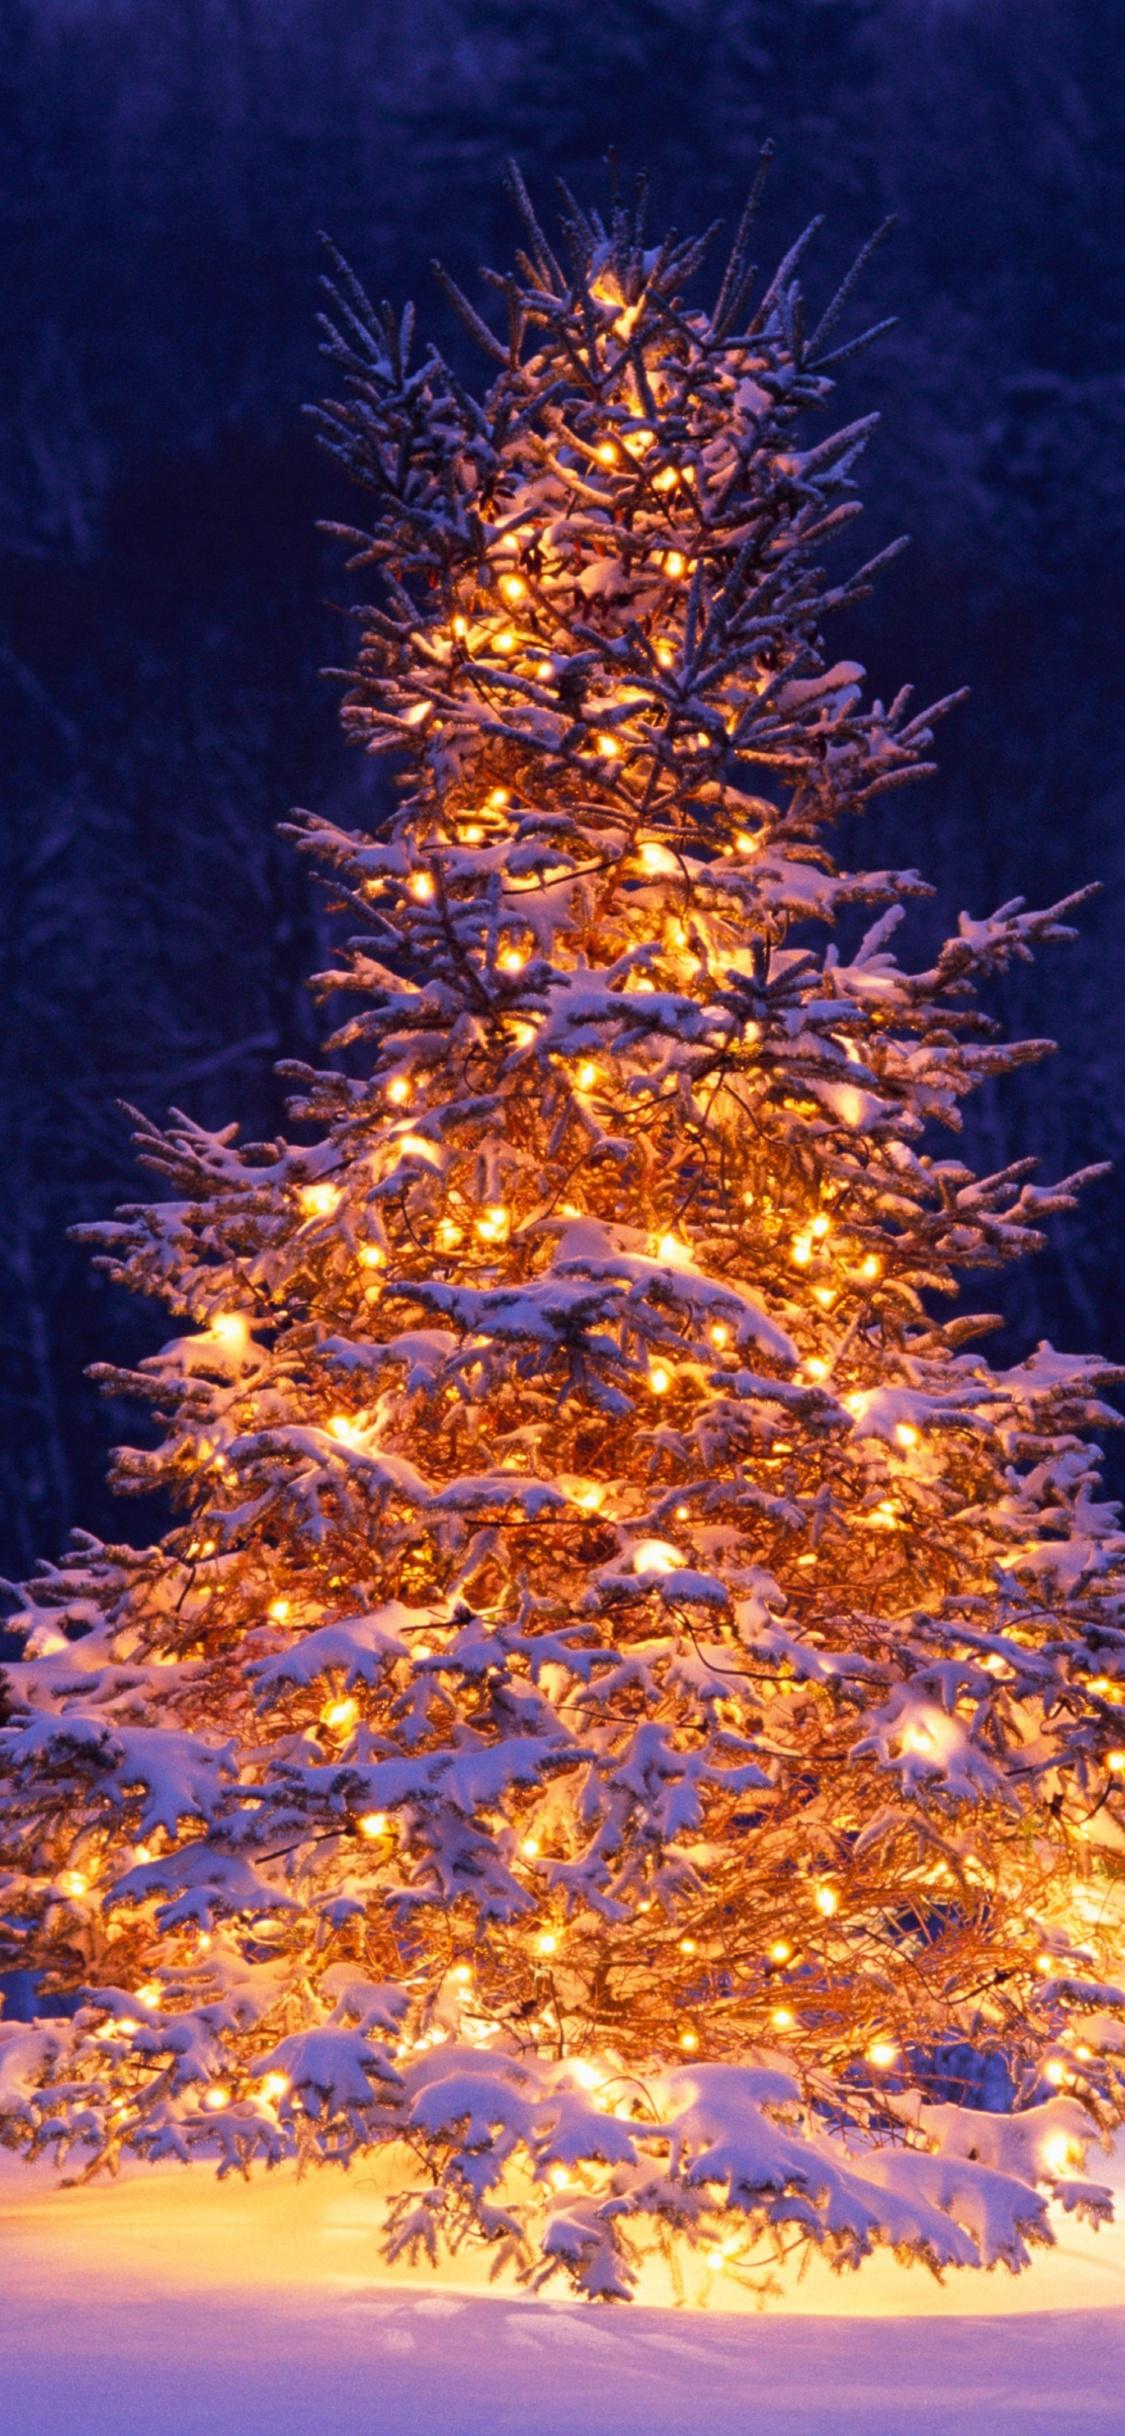 Christmas Tree Chairs Winter Christmas 2017 Holiday Christmas Winter Wonderland Scene 1125x2436 Wallpaper Teahub Io